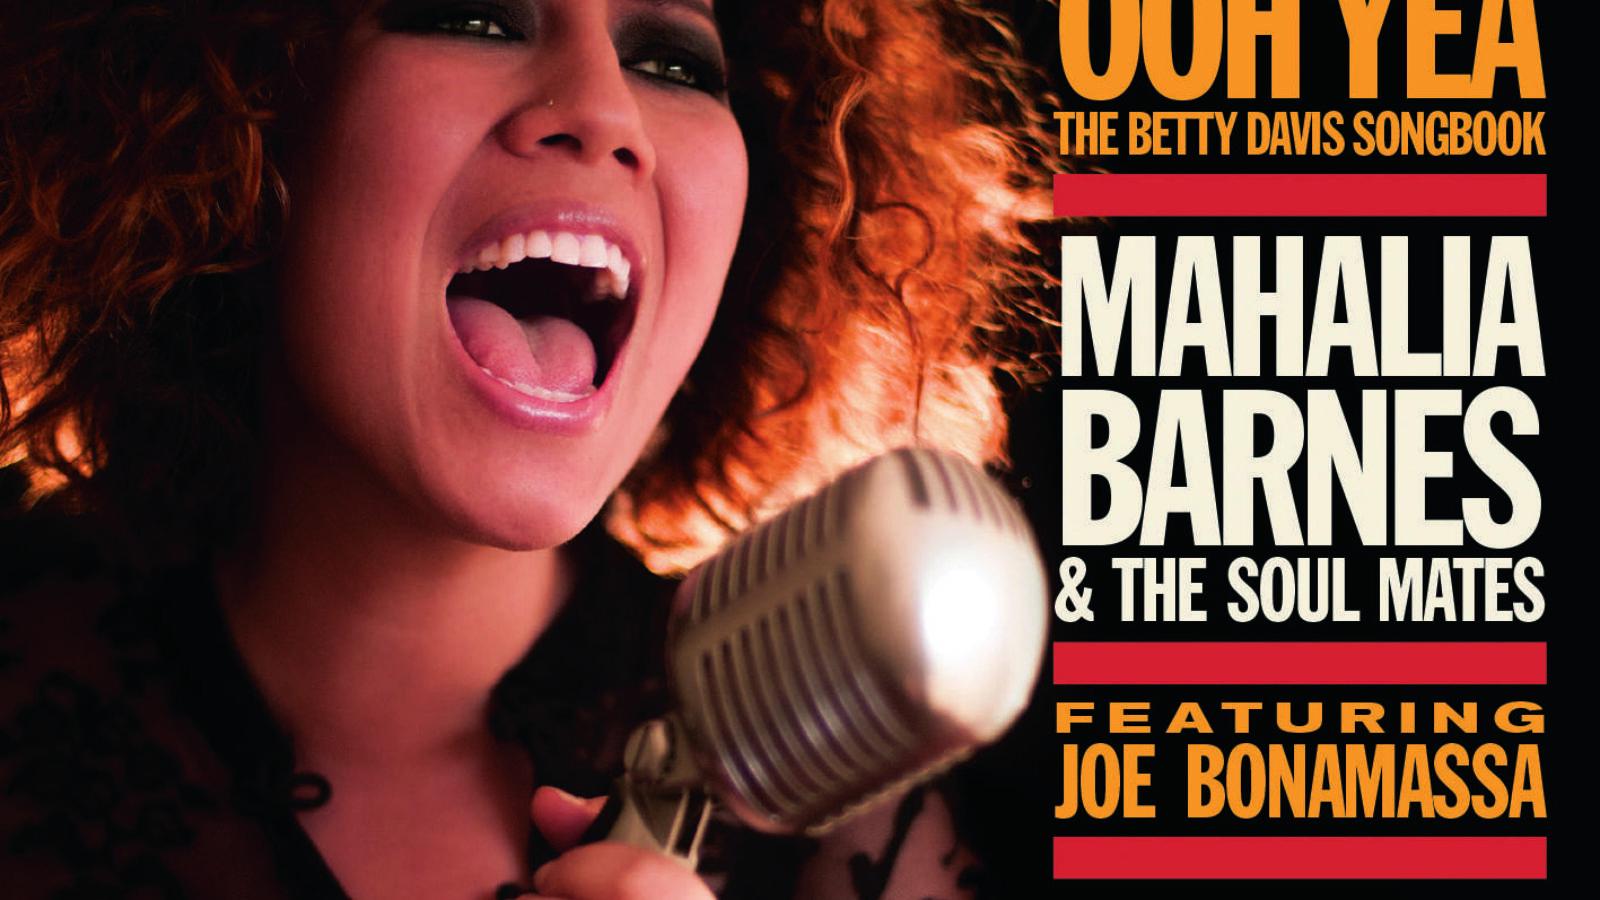 MAHALIA BARNES Ooh Yeah – The Betty Davis Songbook